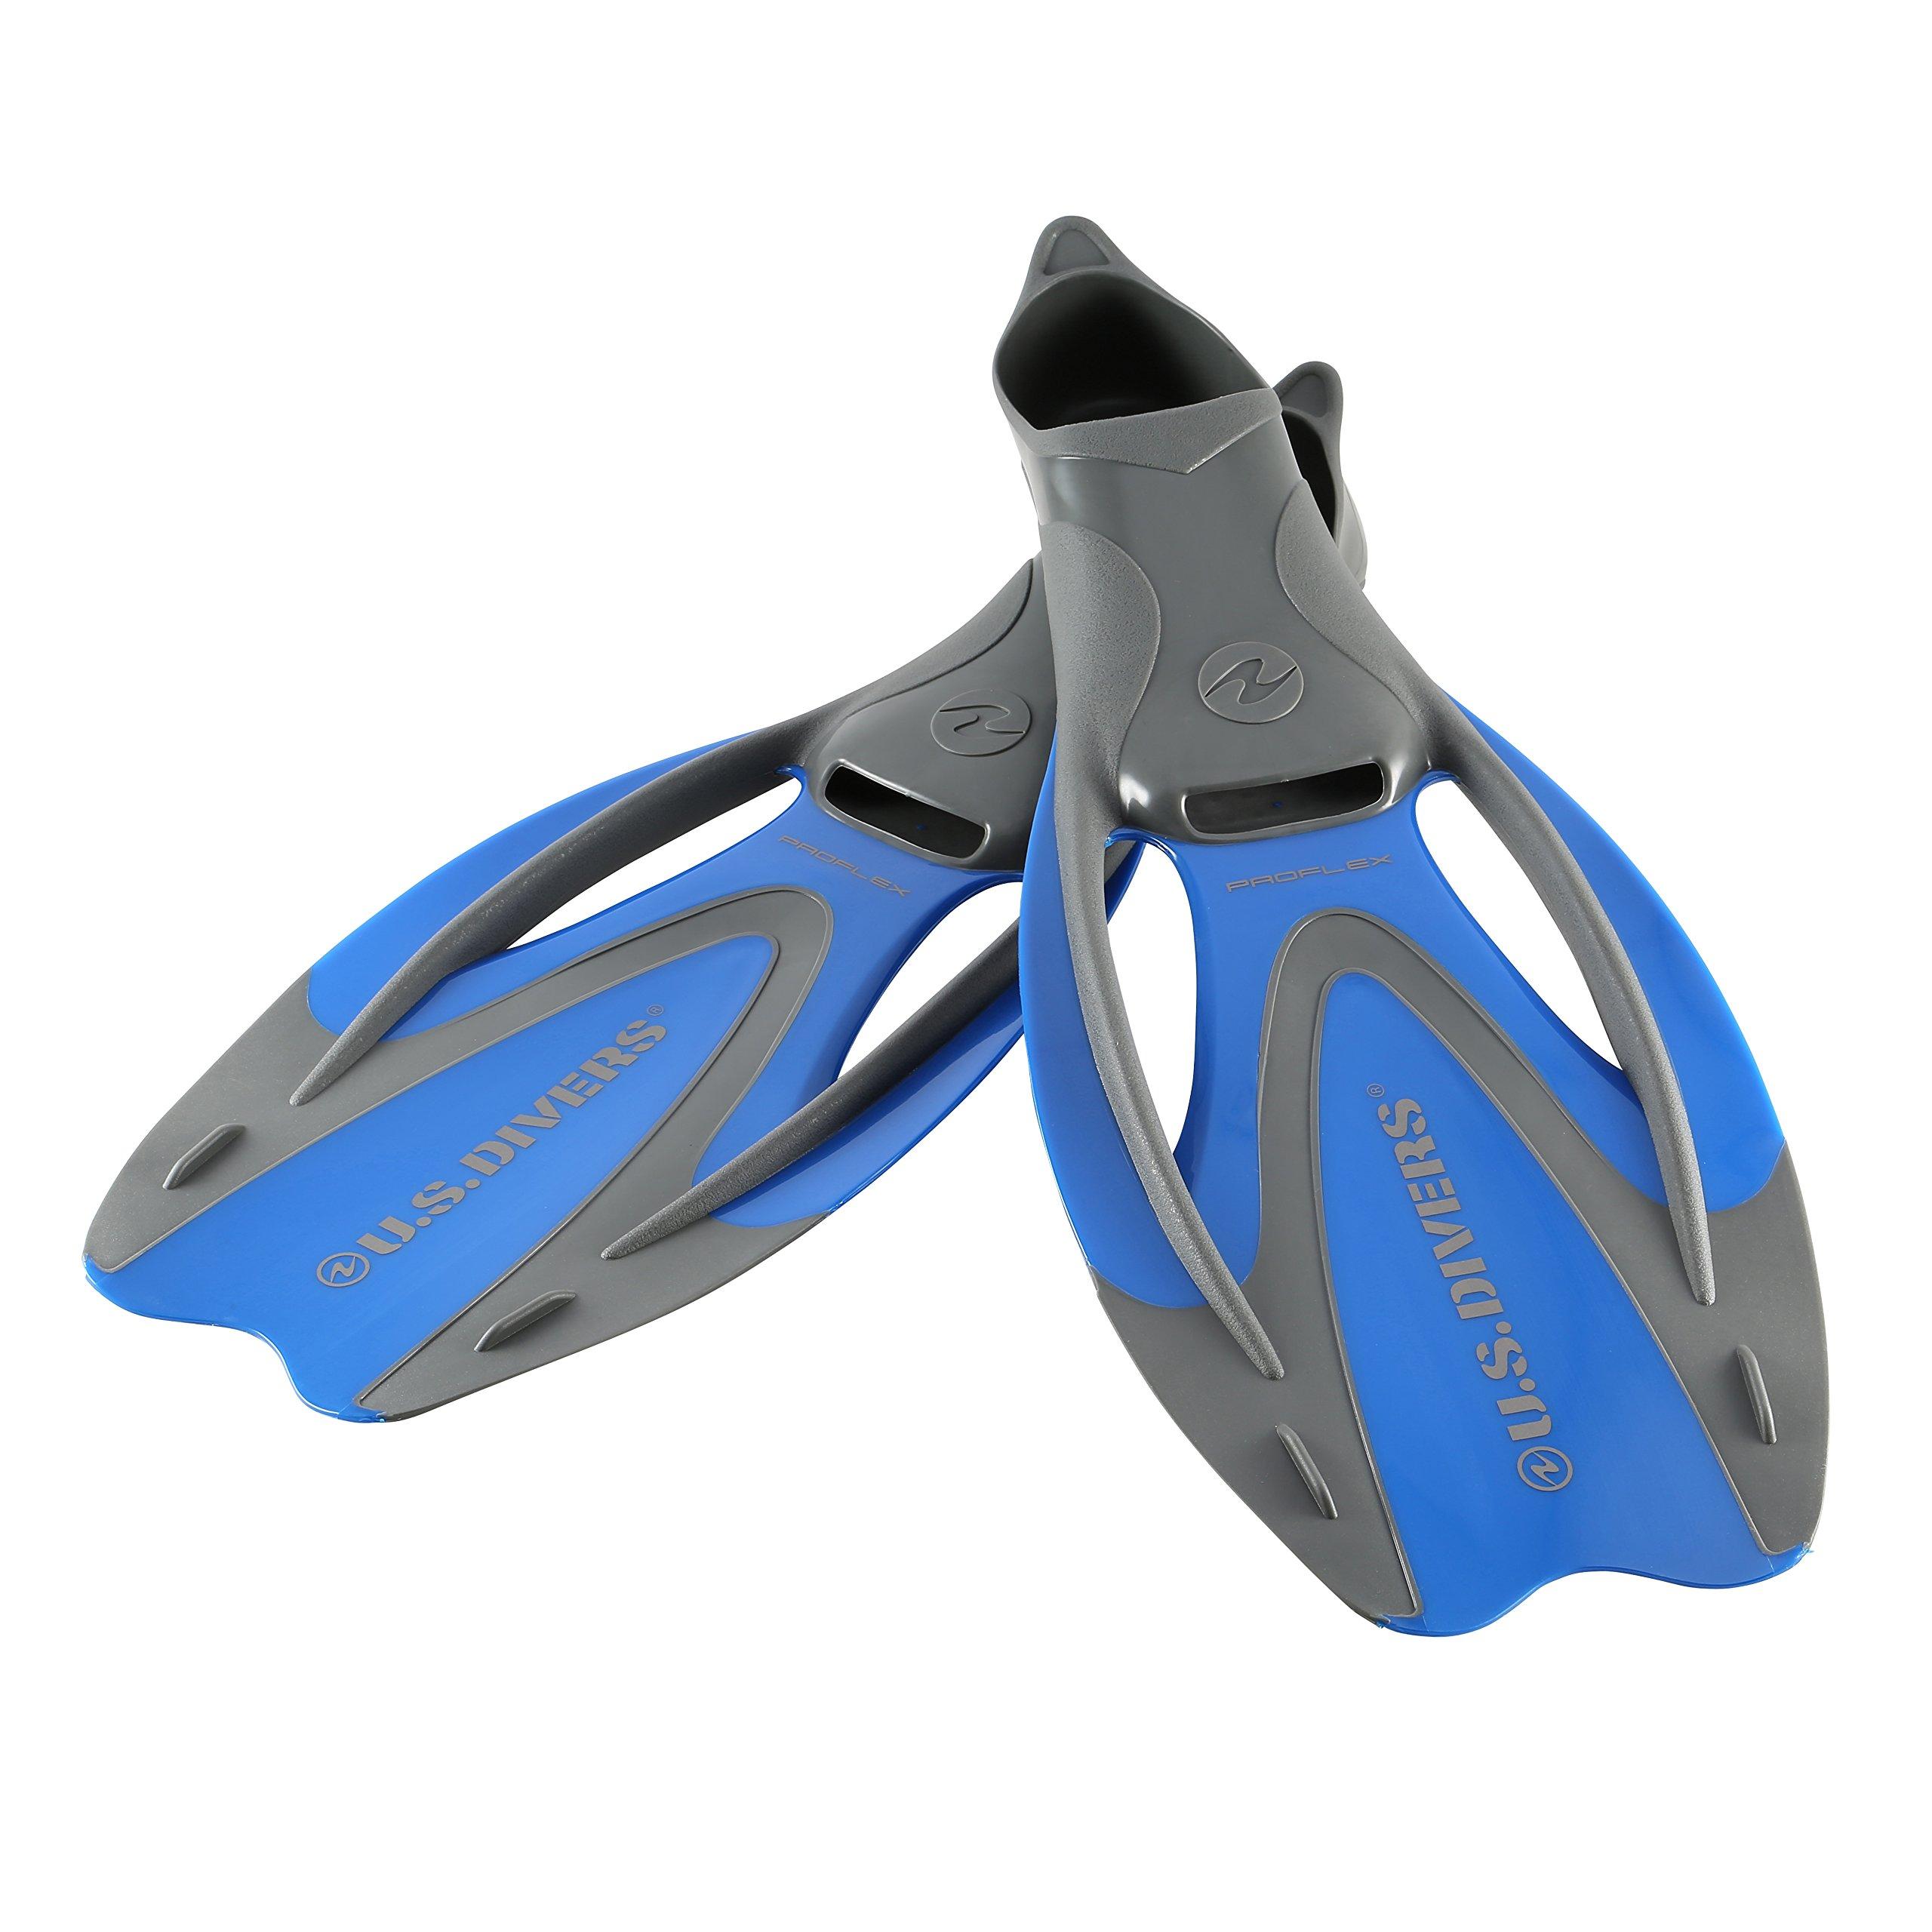 U.S. Divers Proflex II Snorkel Fins (Electric Blue). Adult Dual-Composite Blade Snorkeling Fins (Size Medium. Range 6.5-8) by U.S. Divers